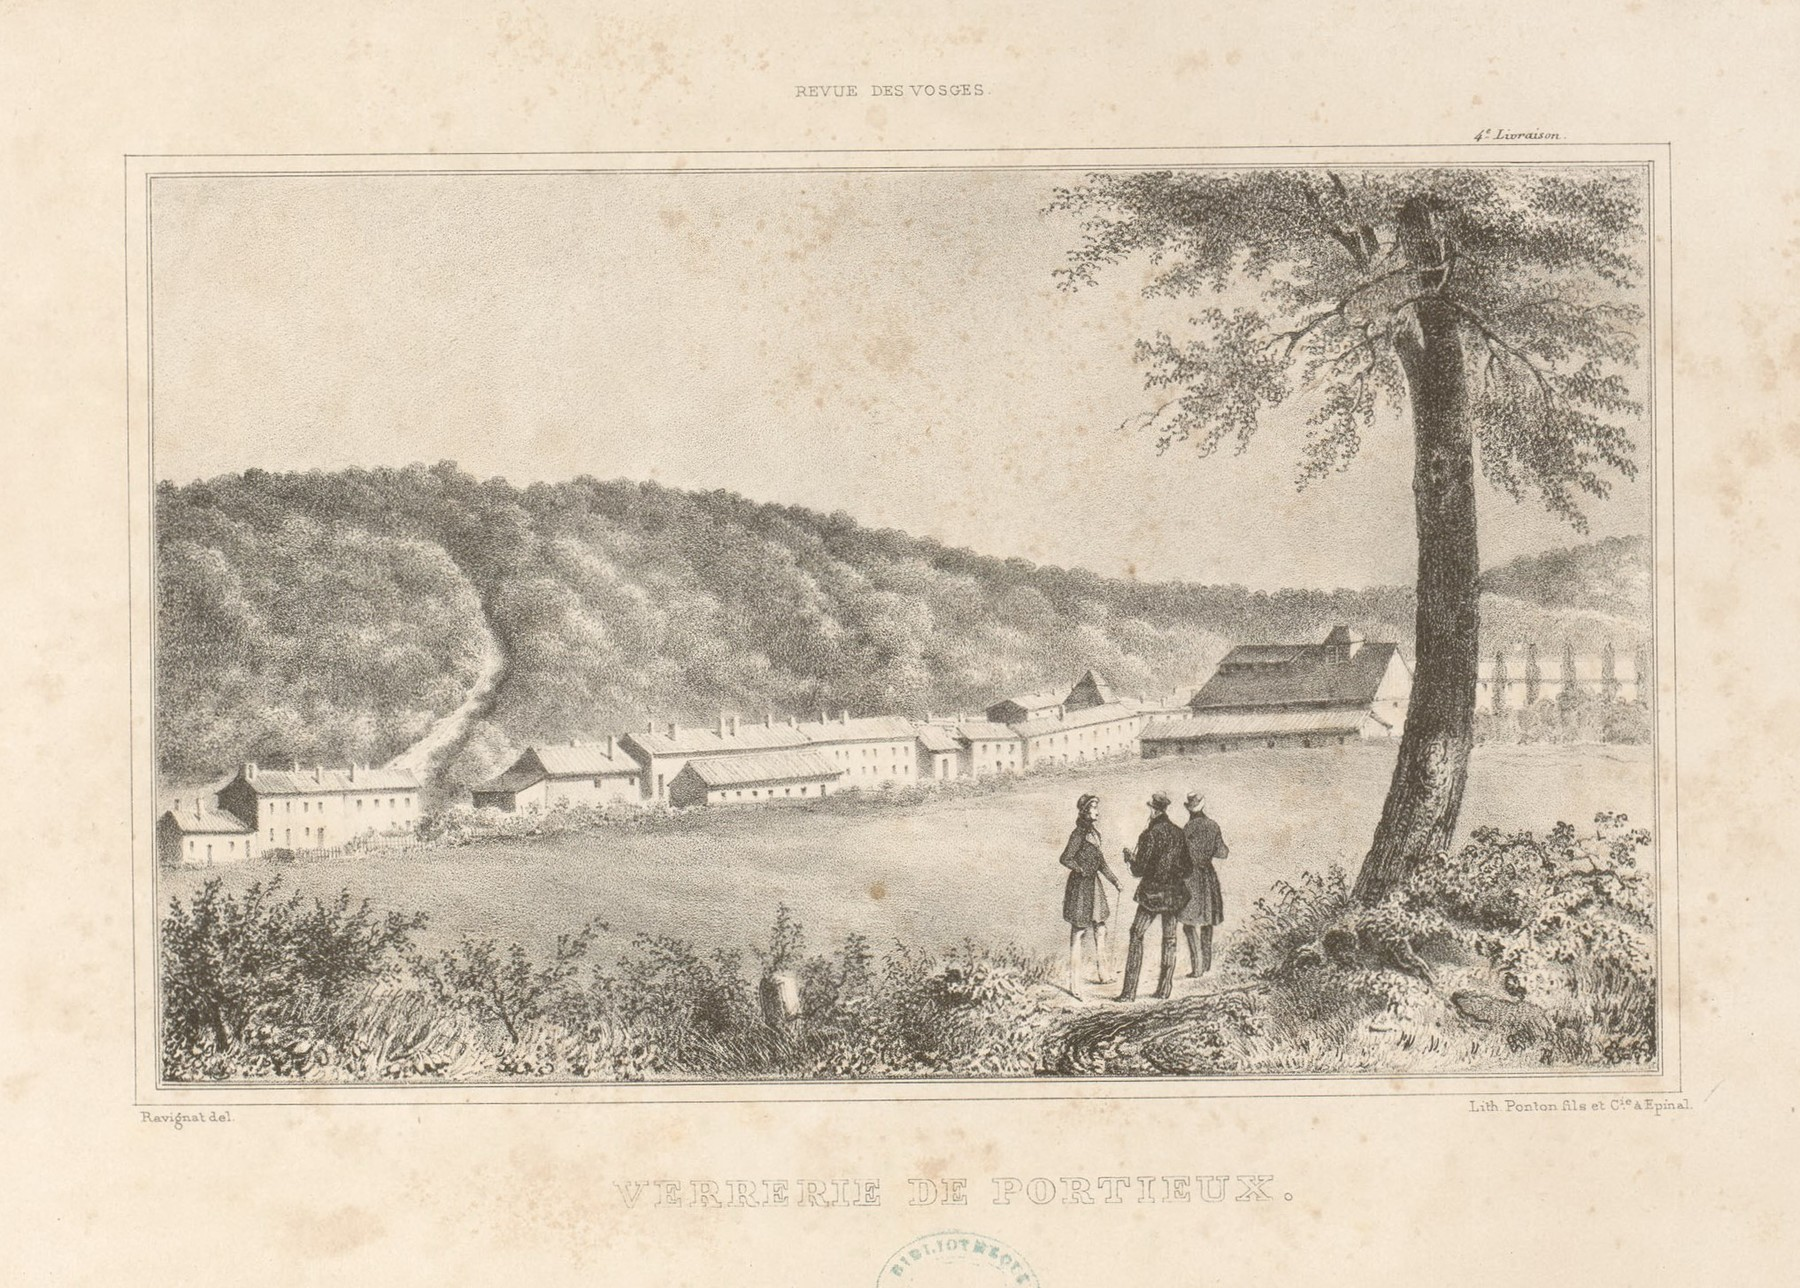 Contenu du Verrerie de Portieux